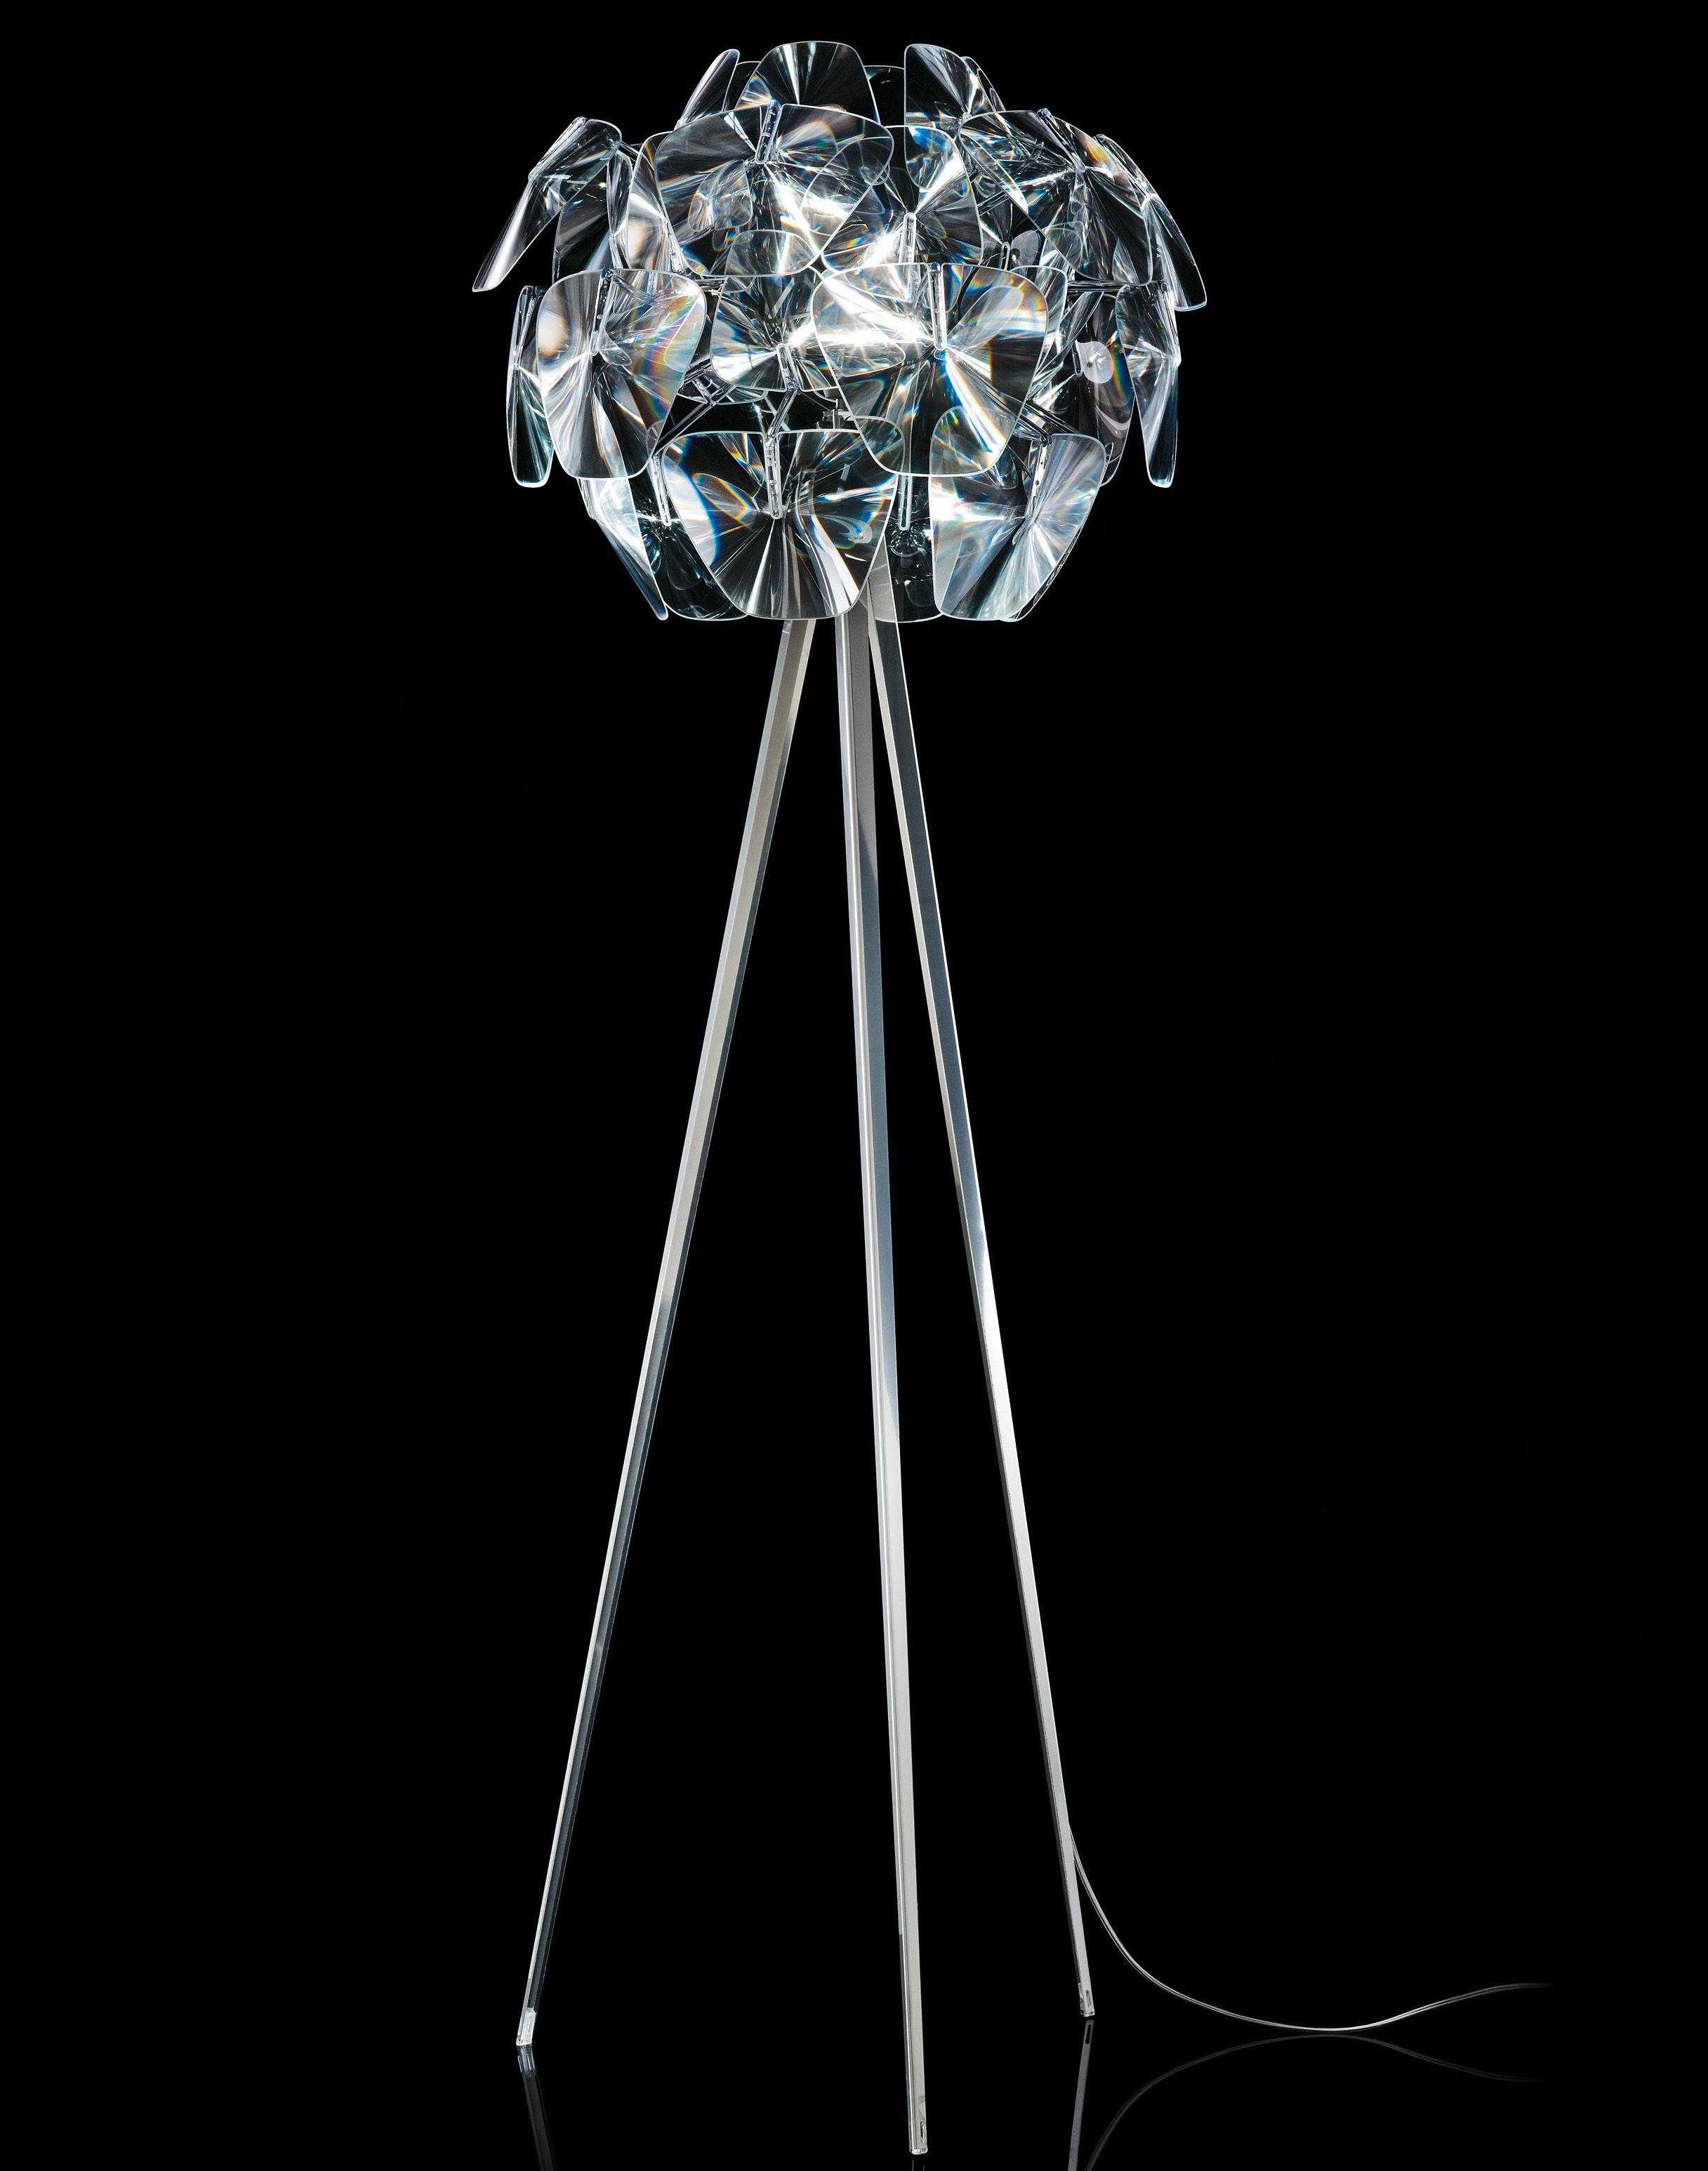 Illuminazione - Lampade da terra - Lampada a stelo Hope - / treppiede - H 198 cm di Luceplan - Trasparente - Lampada treppiede - Acciaio inossidabile lucido, policarbonato